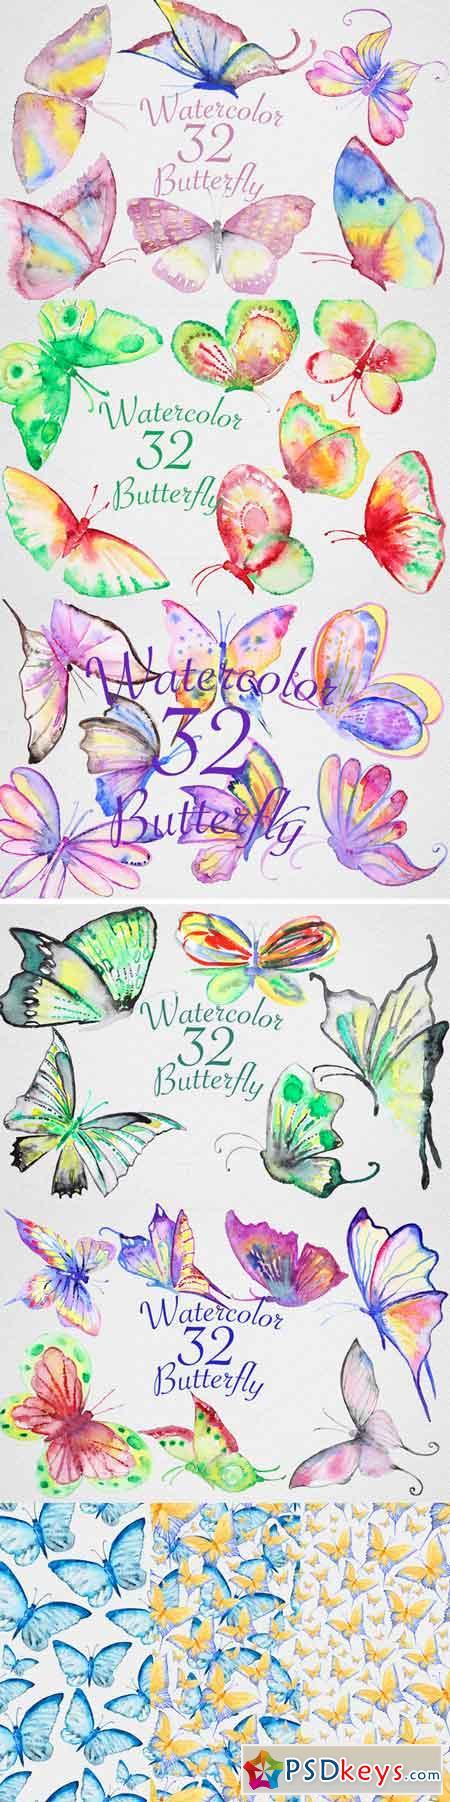 Watercolor Butterfly Set2 671539